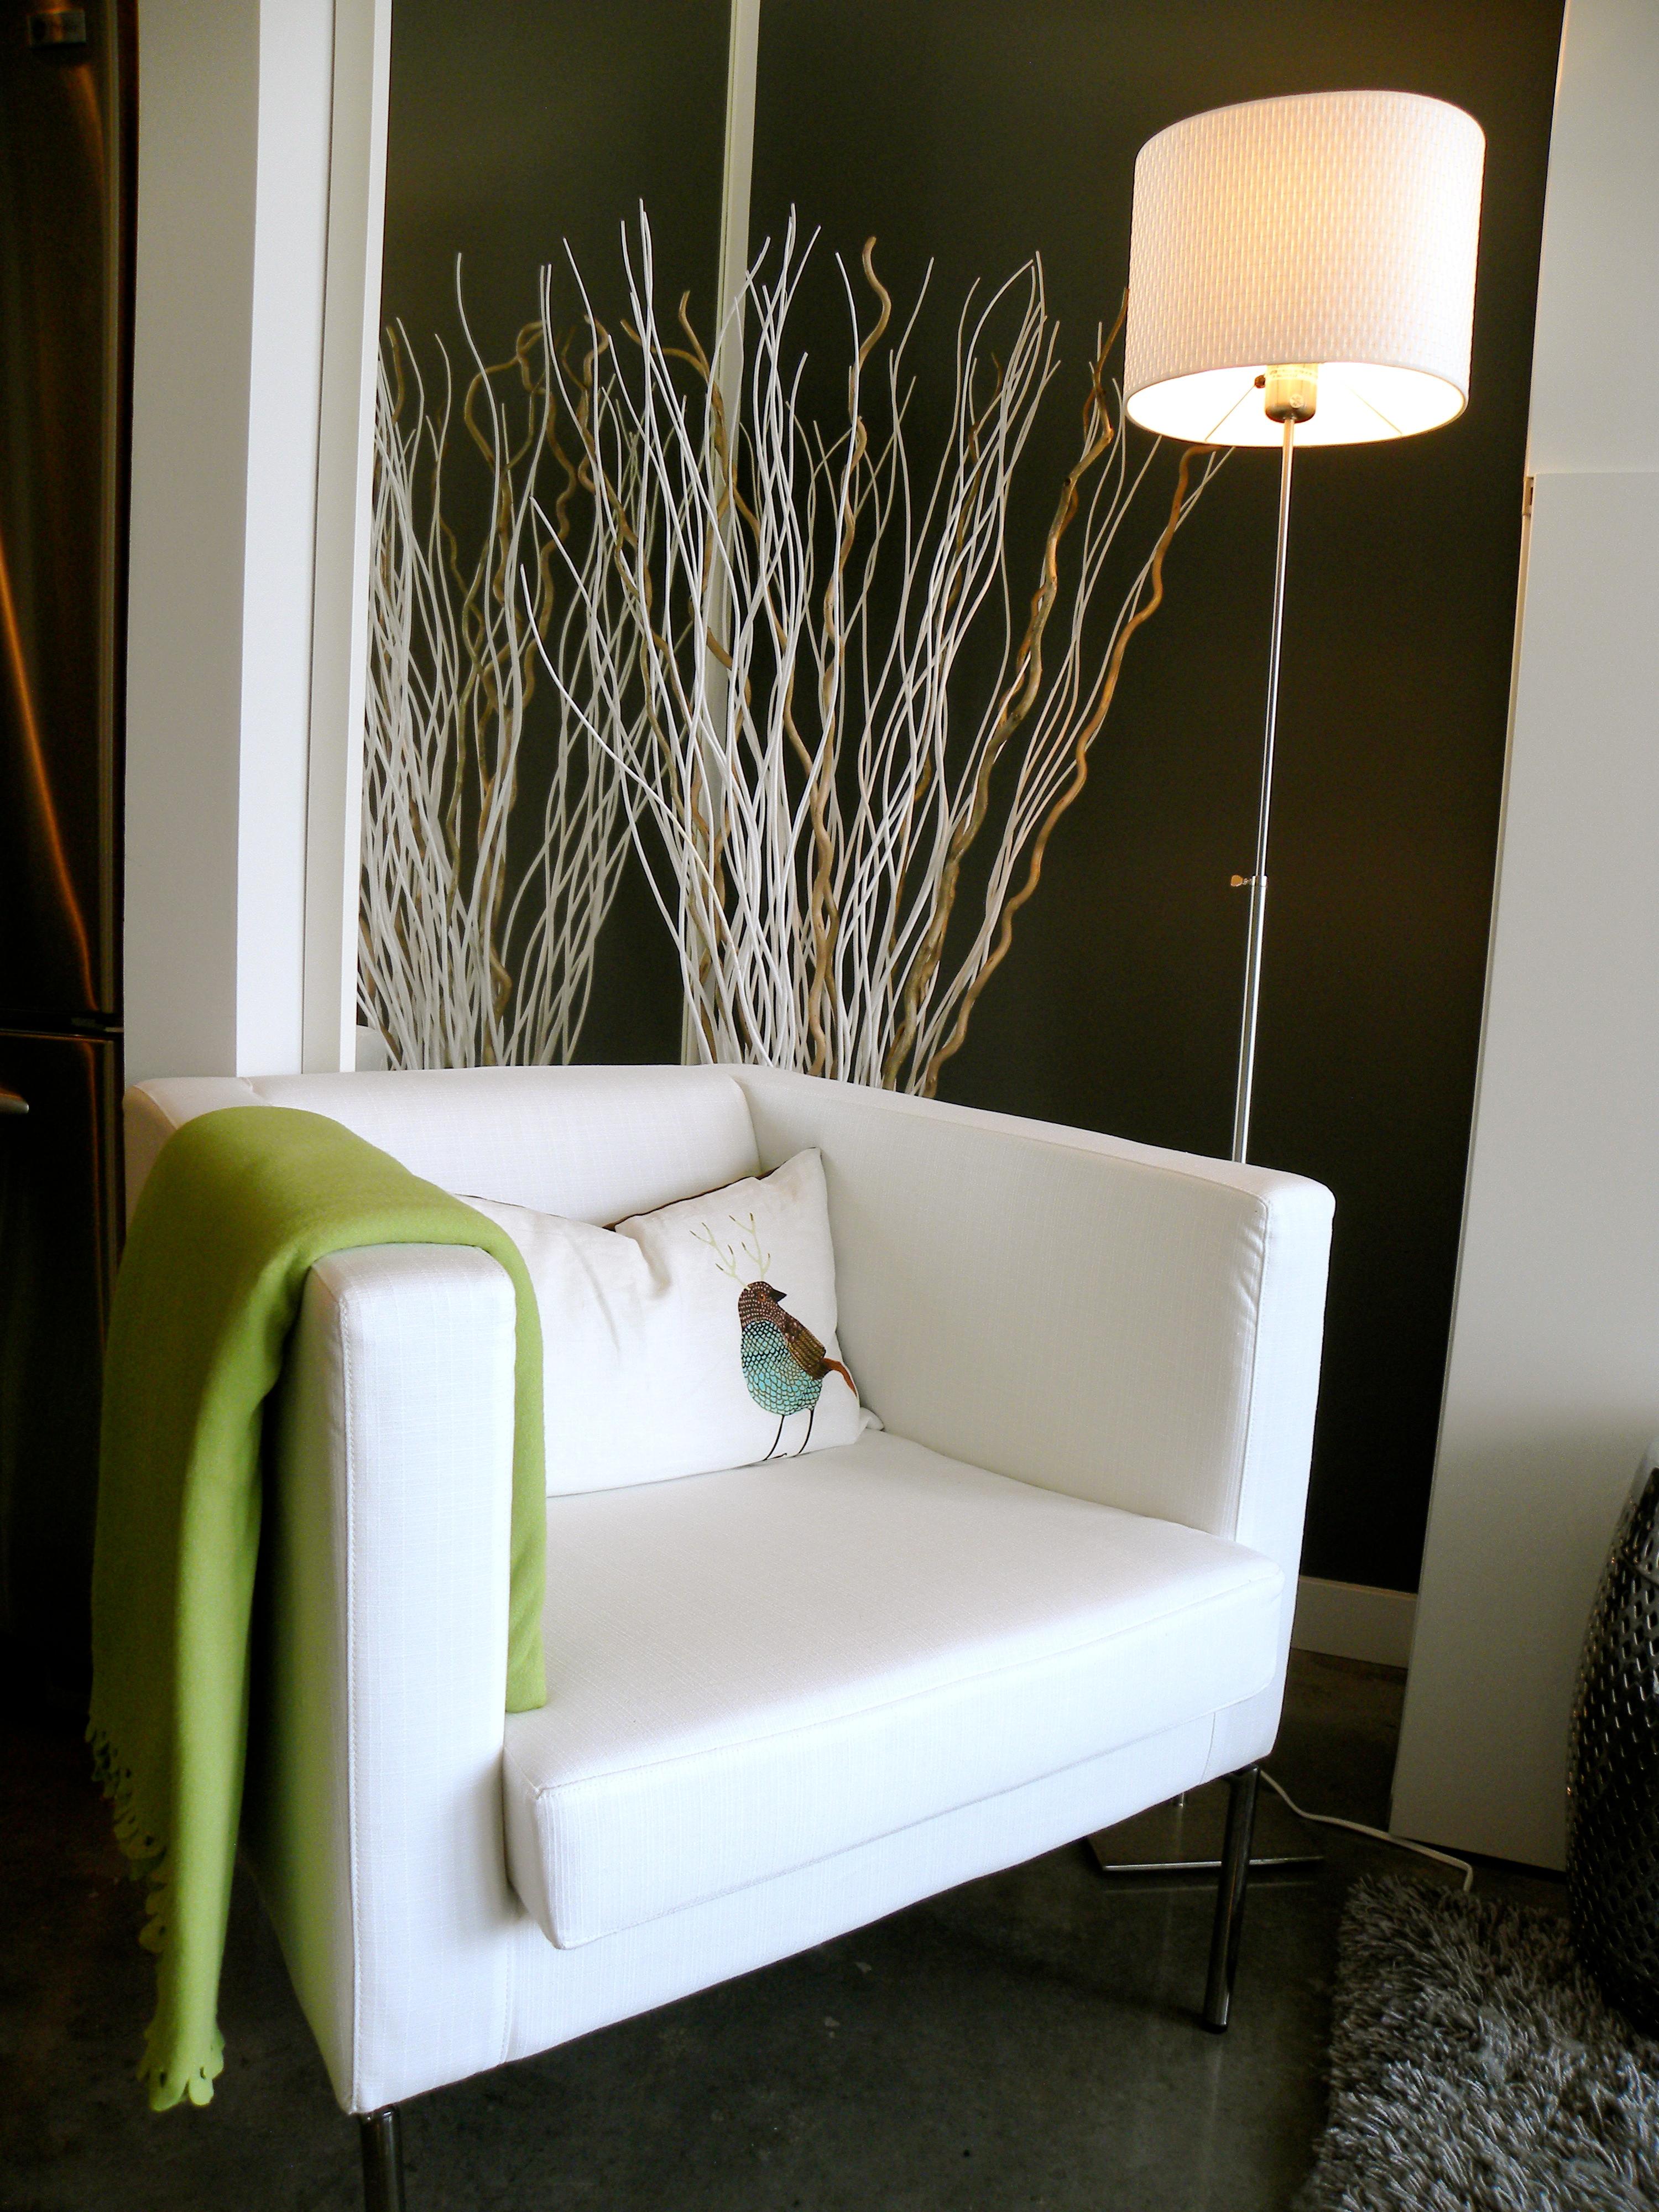 ModerNash Furniture Supply Corporation image 11